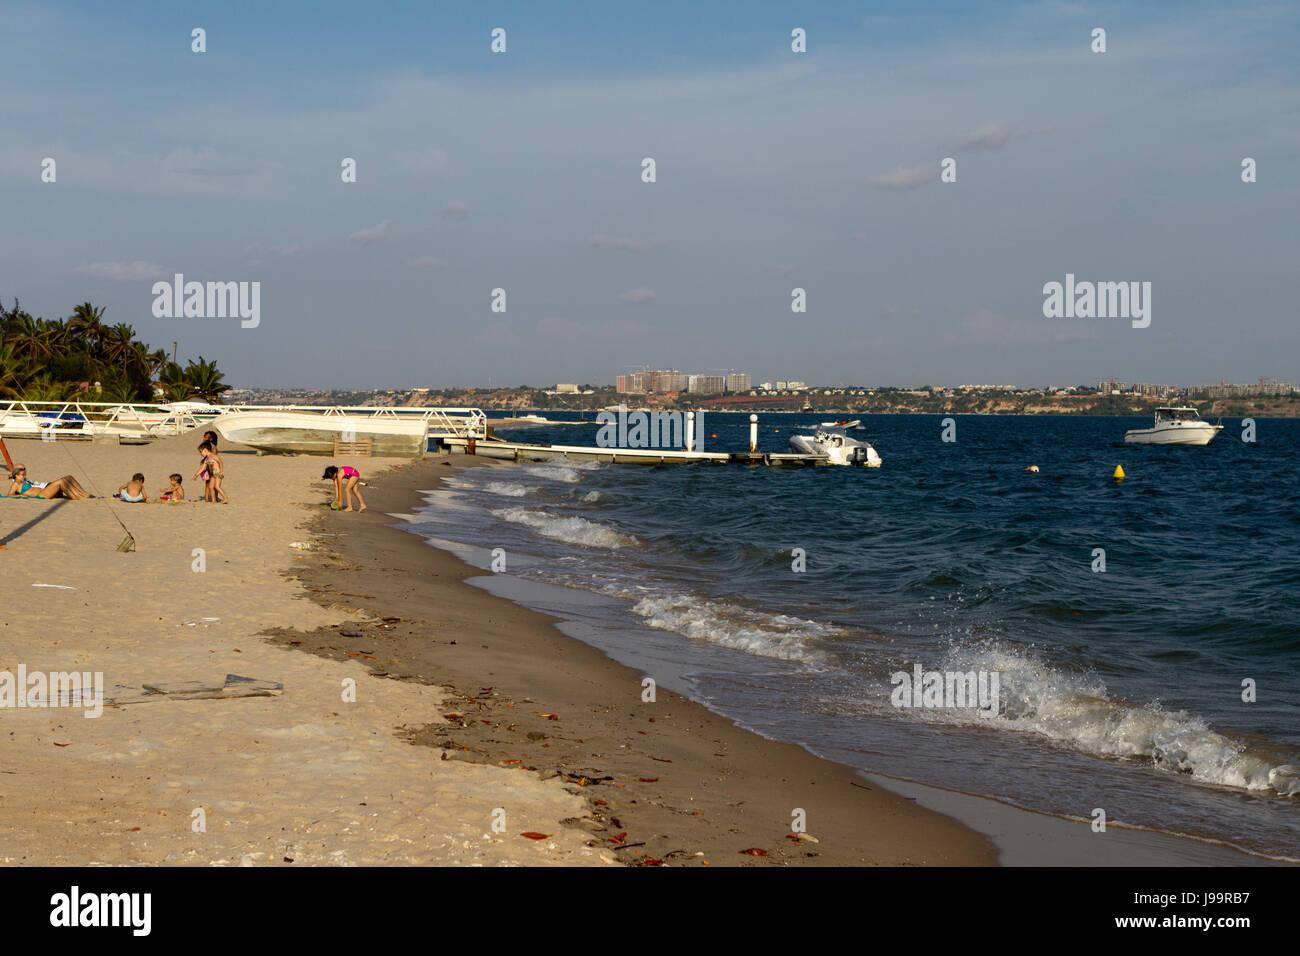 Mussulo island, Angola Luanda - Stock Image